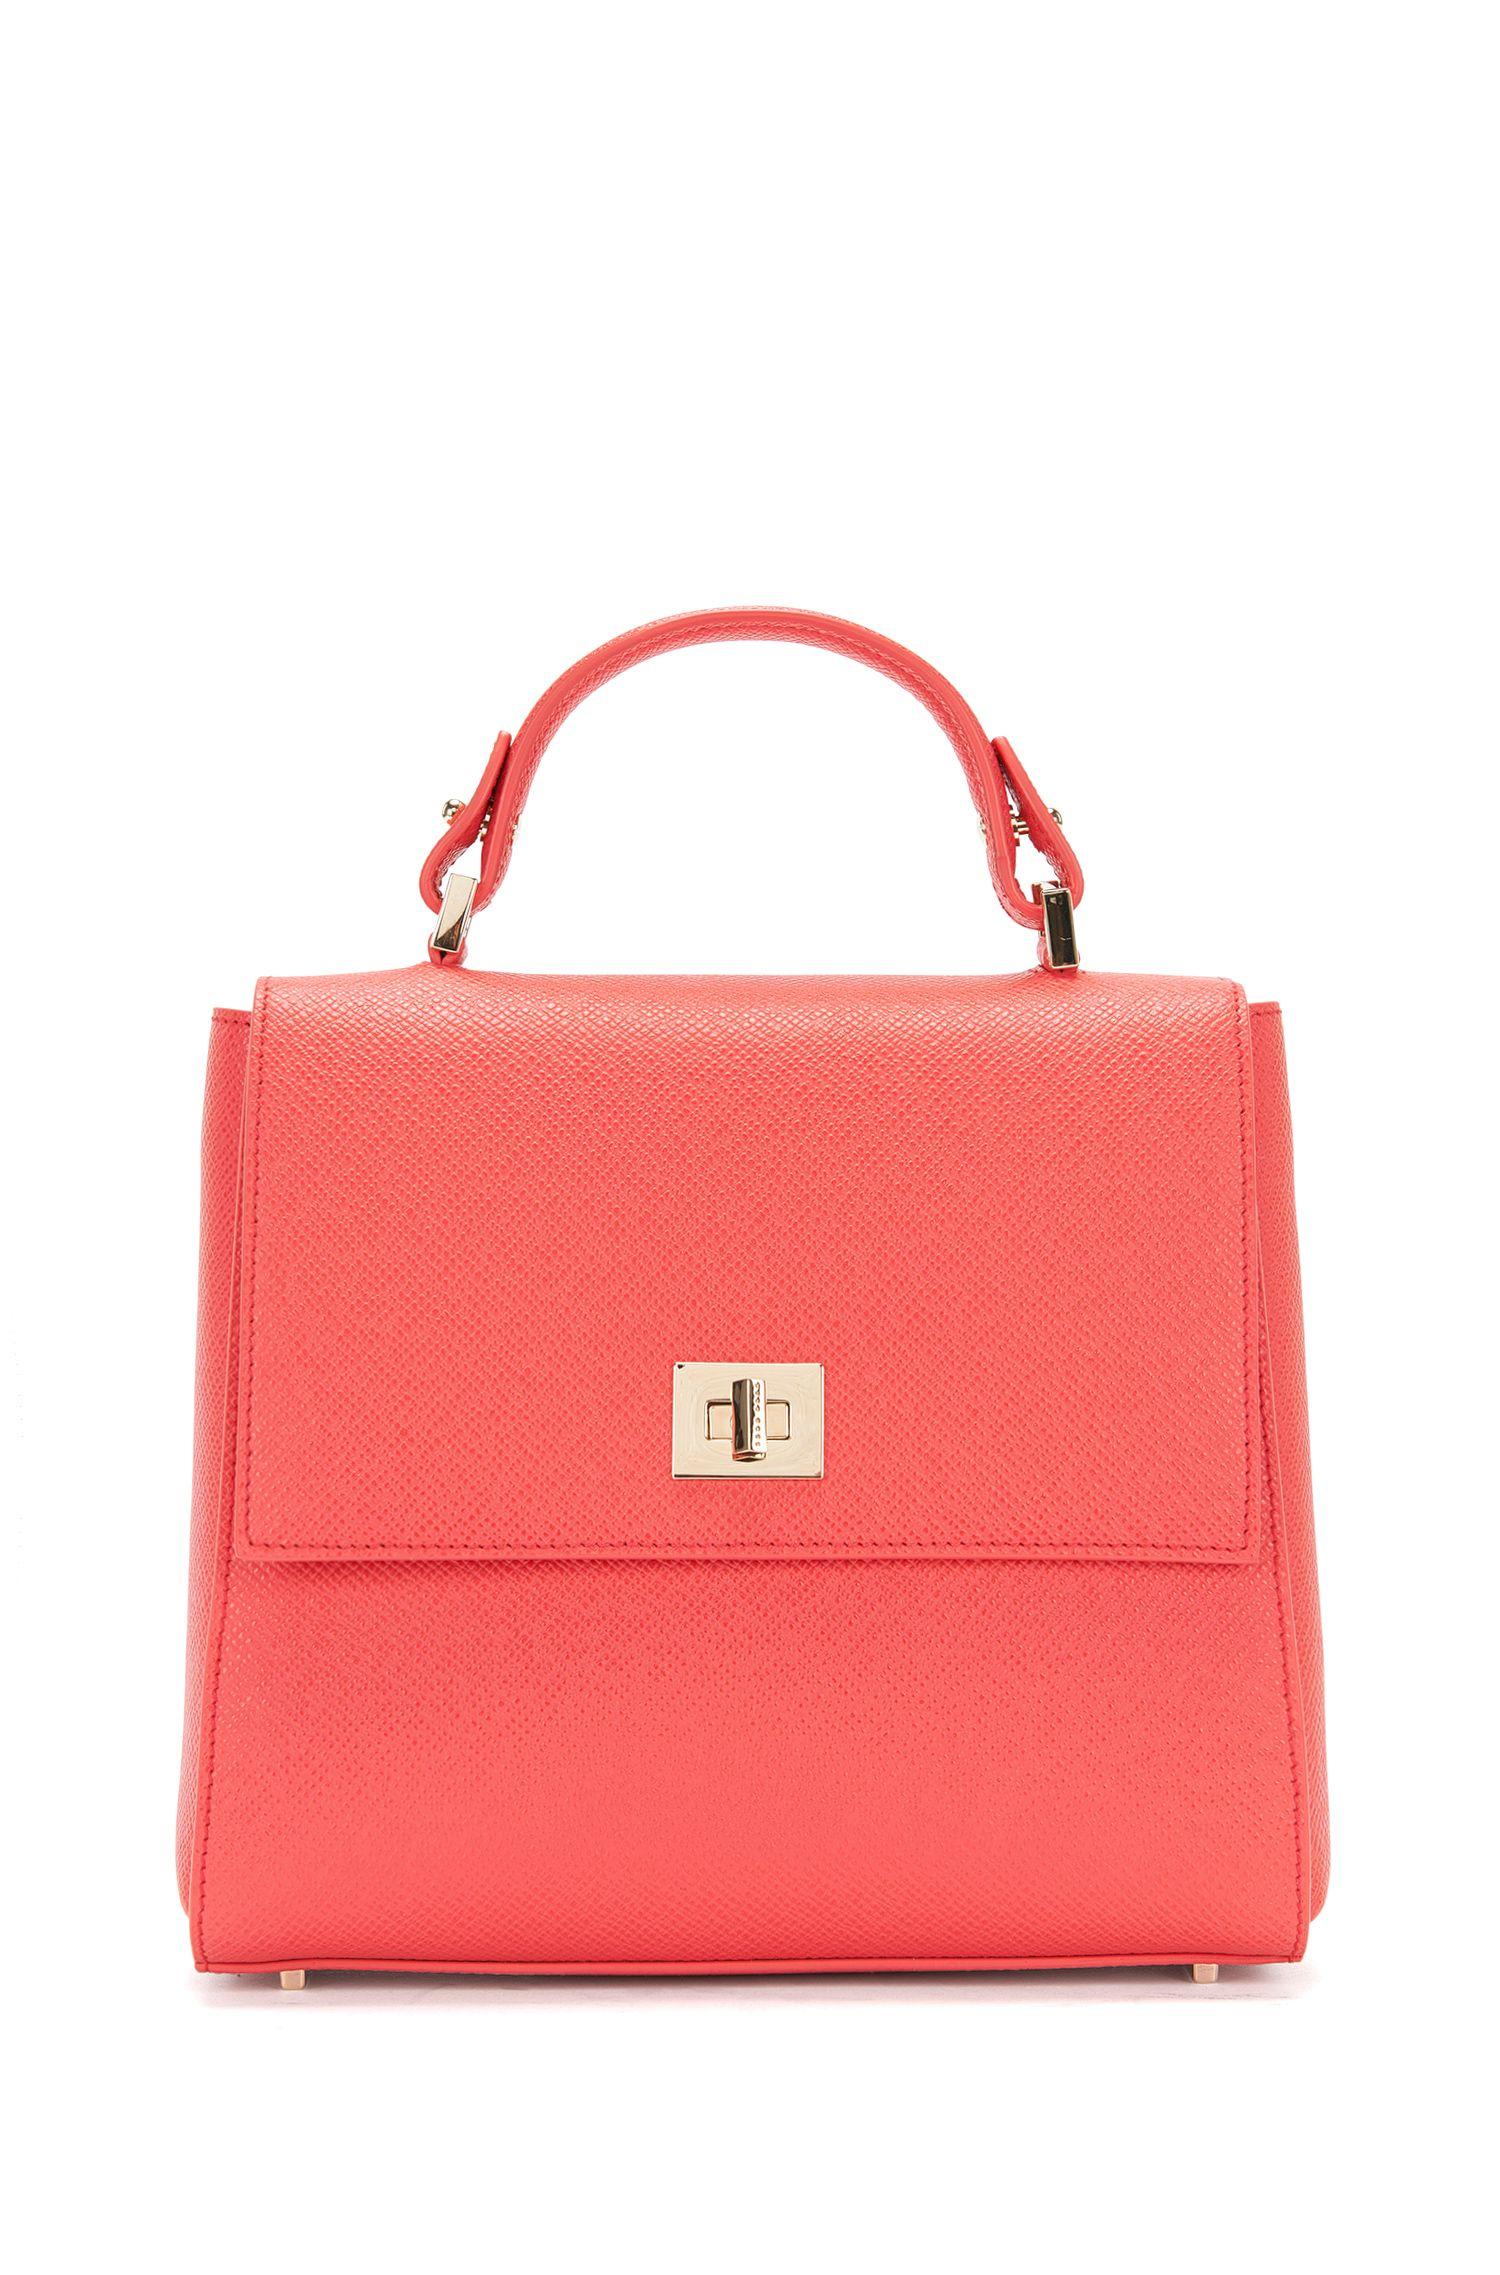 'Bespoke'   Calfskin Bag, Detachable Strap